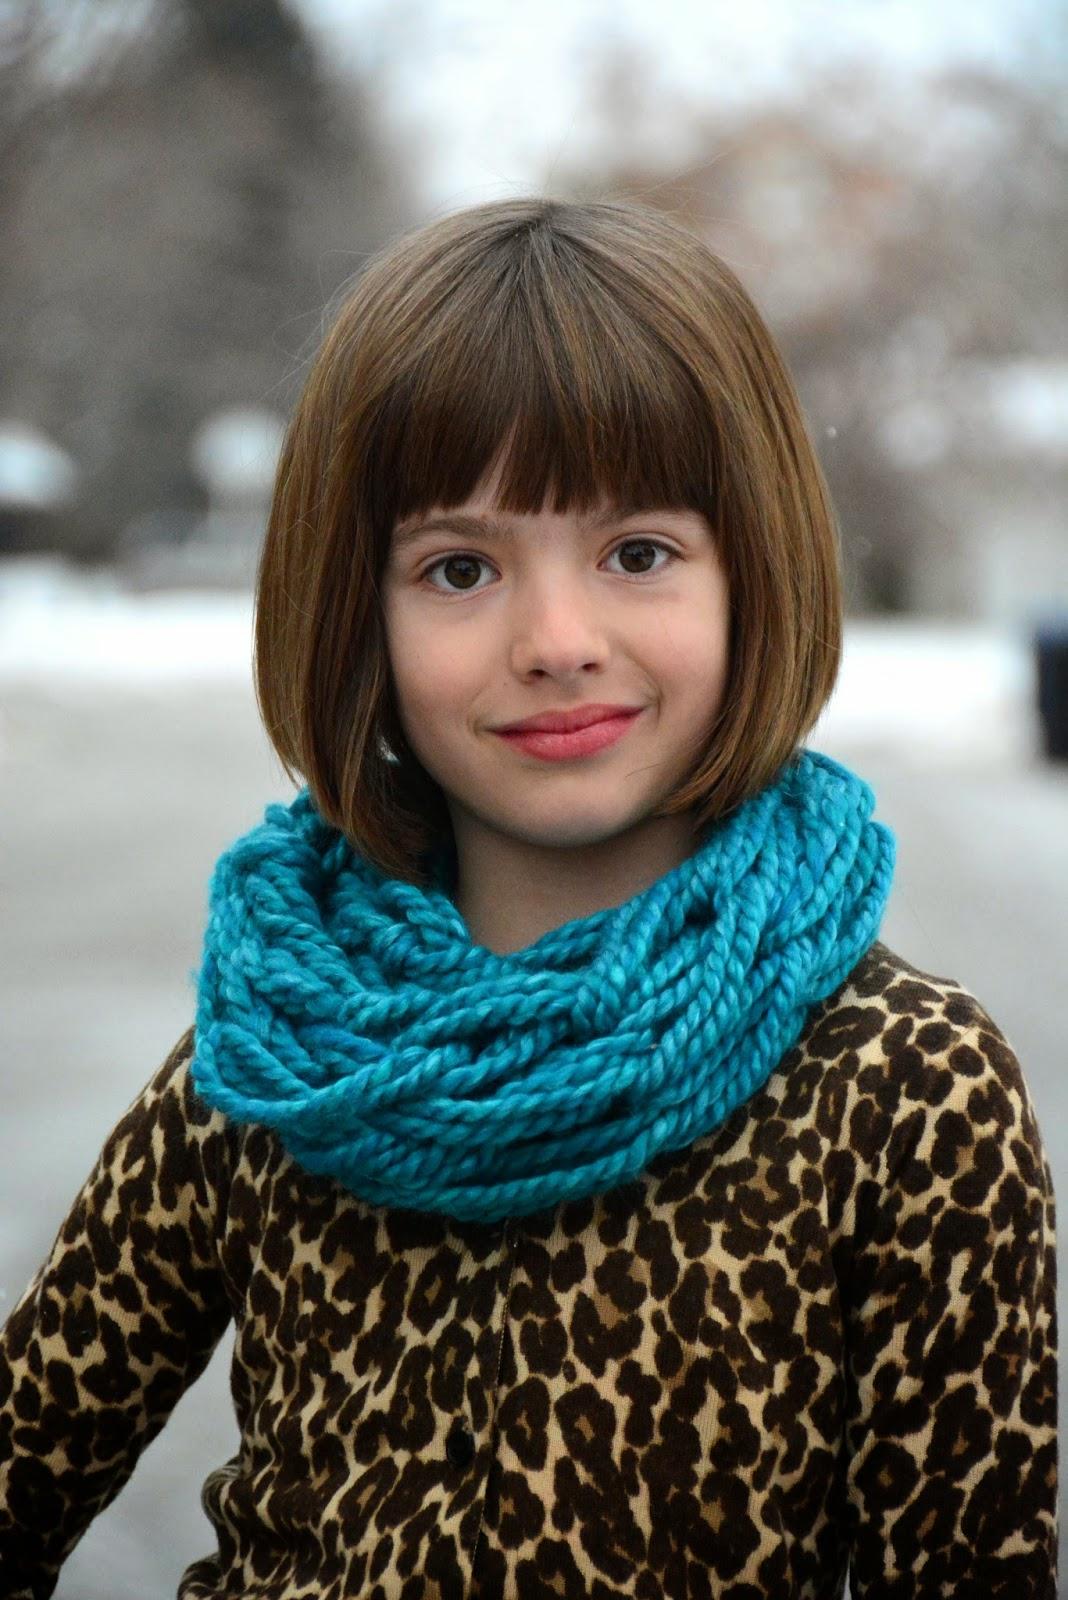 Arm Knitting Cowl : Aesthetic nest knitting arm knit child s cowl tutorial